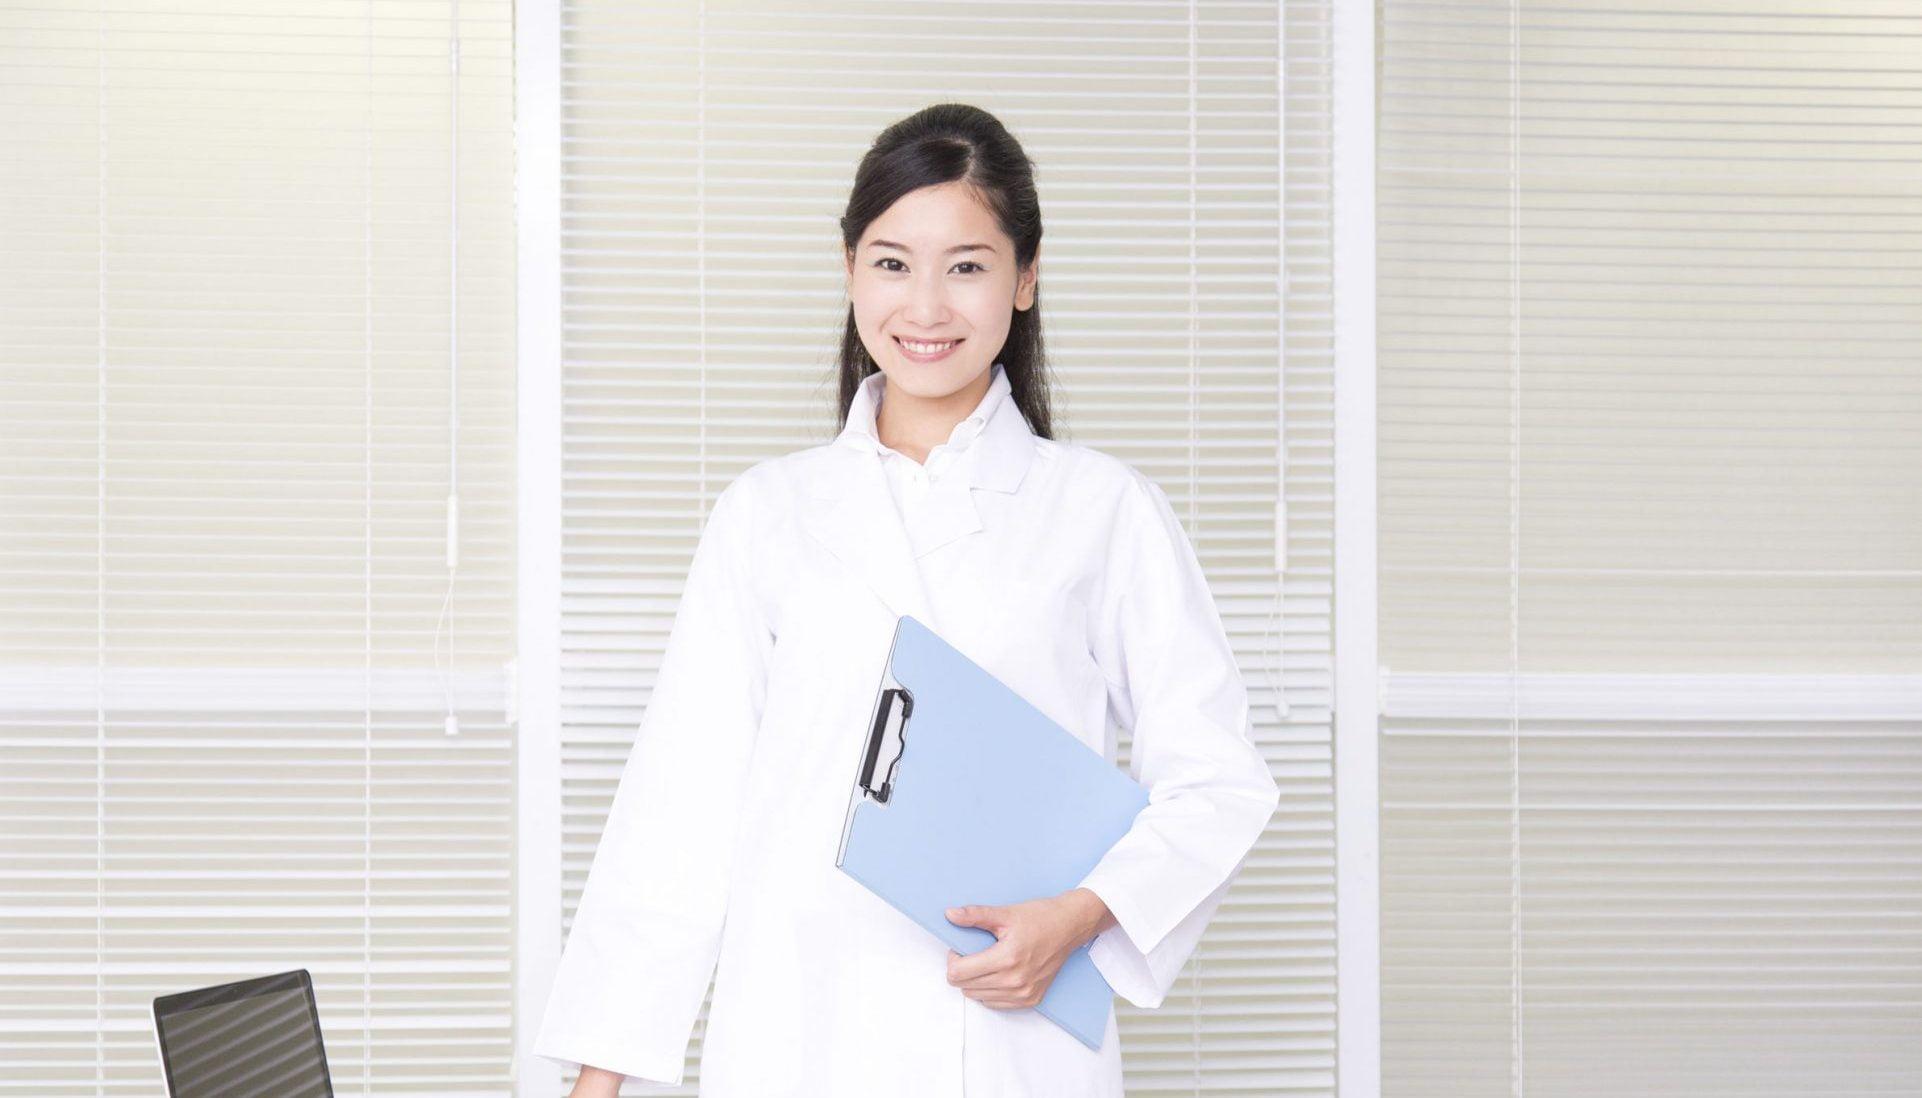 pharmacist student advancing practice advanced practice study academics academia research pharmacy